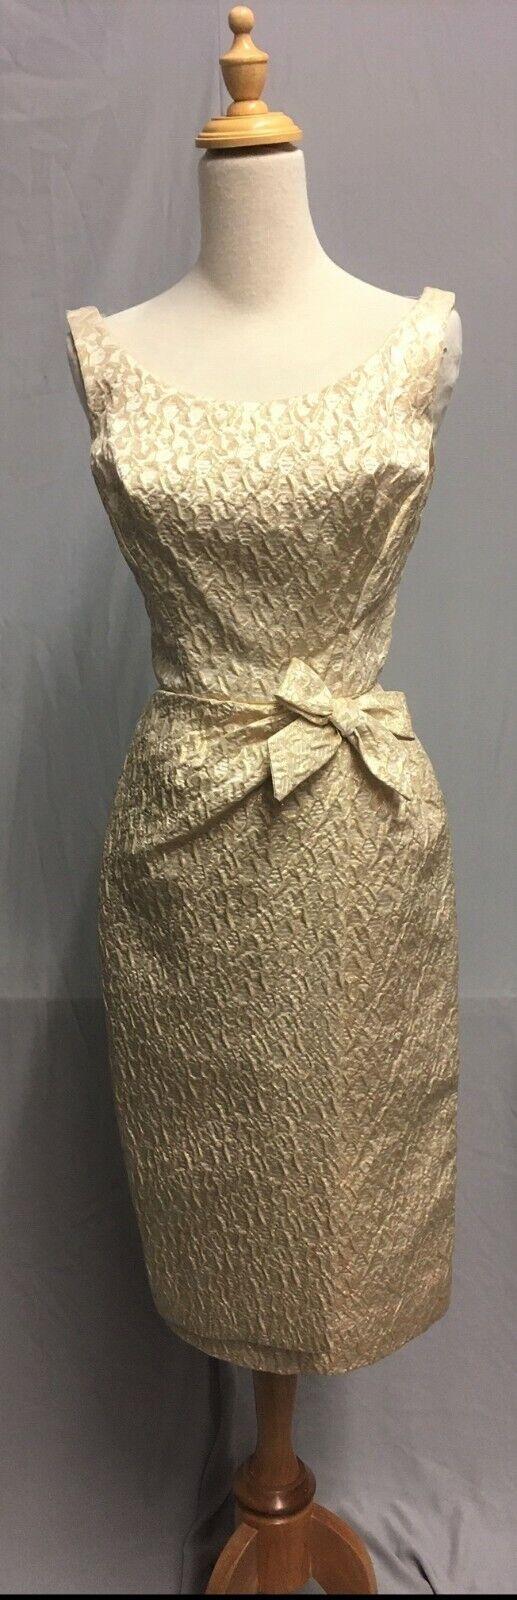 #20-082, 1950's Gold Metallic Brocade Hollywood Glamour Cocktail Dress